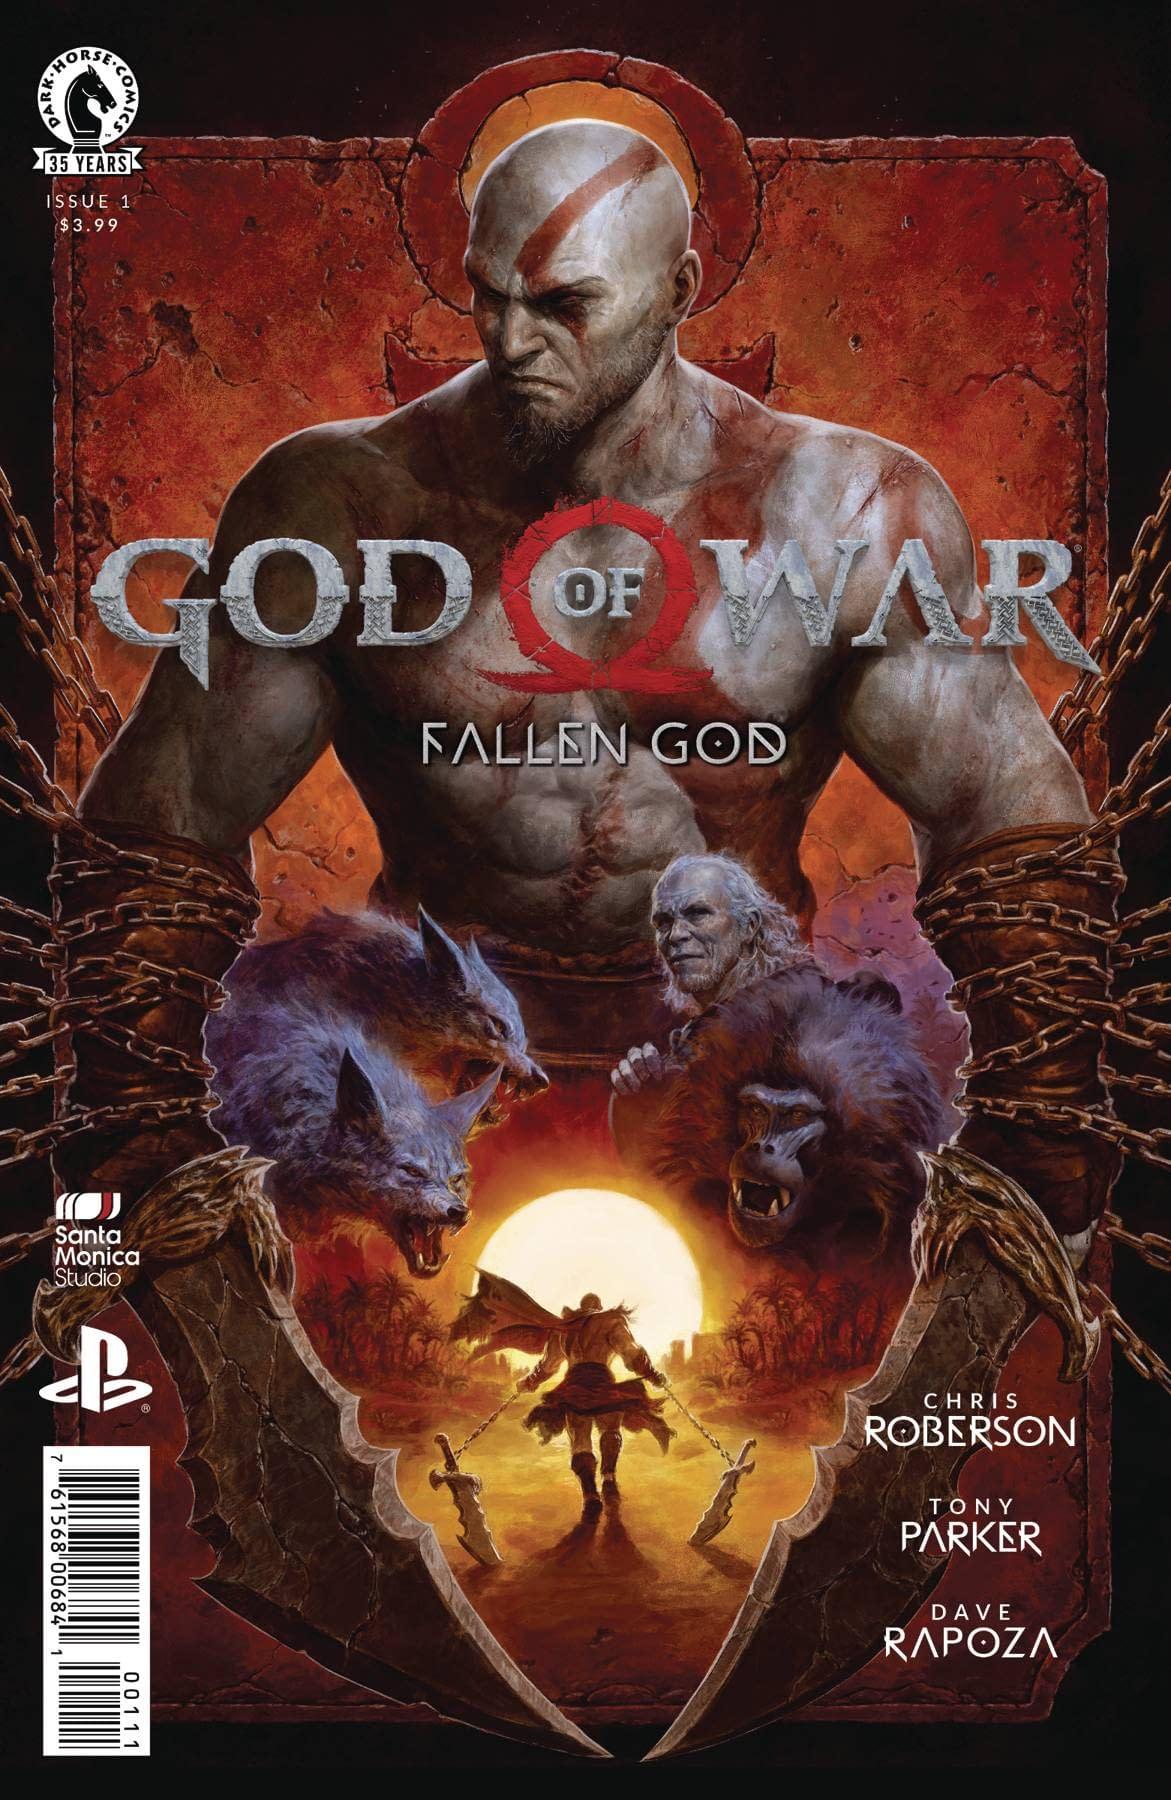 GOD OF WAR FALLEN GOD #1 (OF 4) (RES)